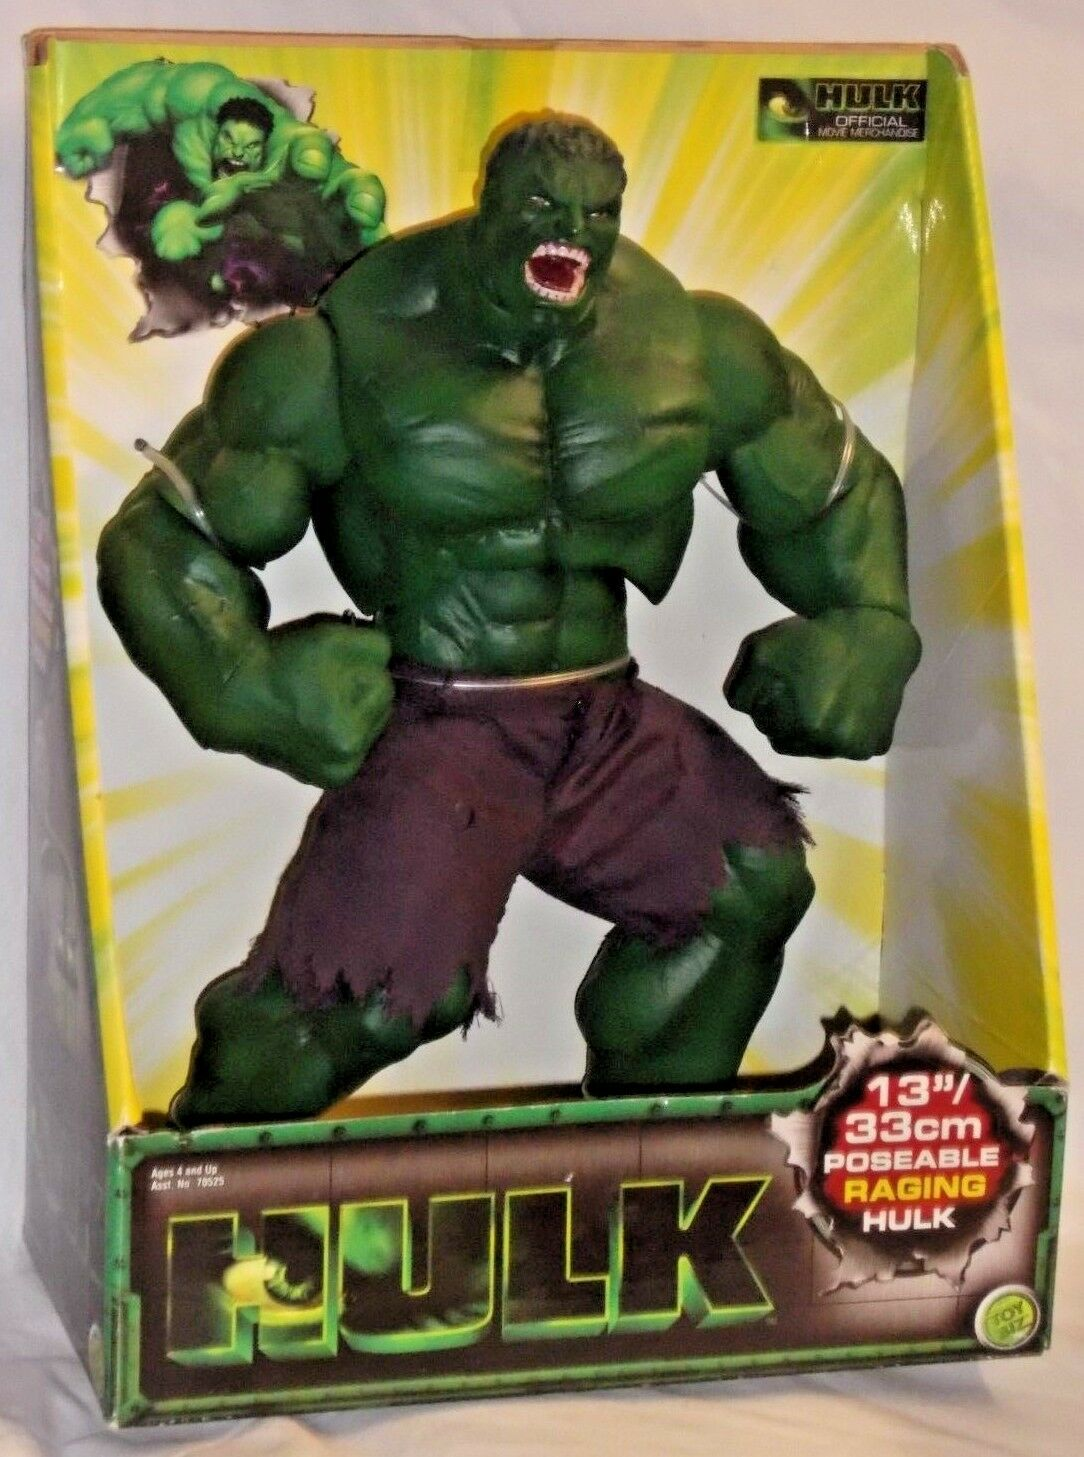 TOYBIZ Marvel redocast mean INCREDIBLE HULK RAGING Poseable Action Figure 2003